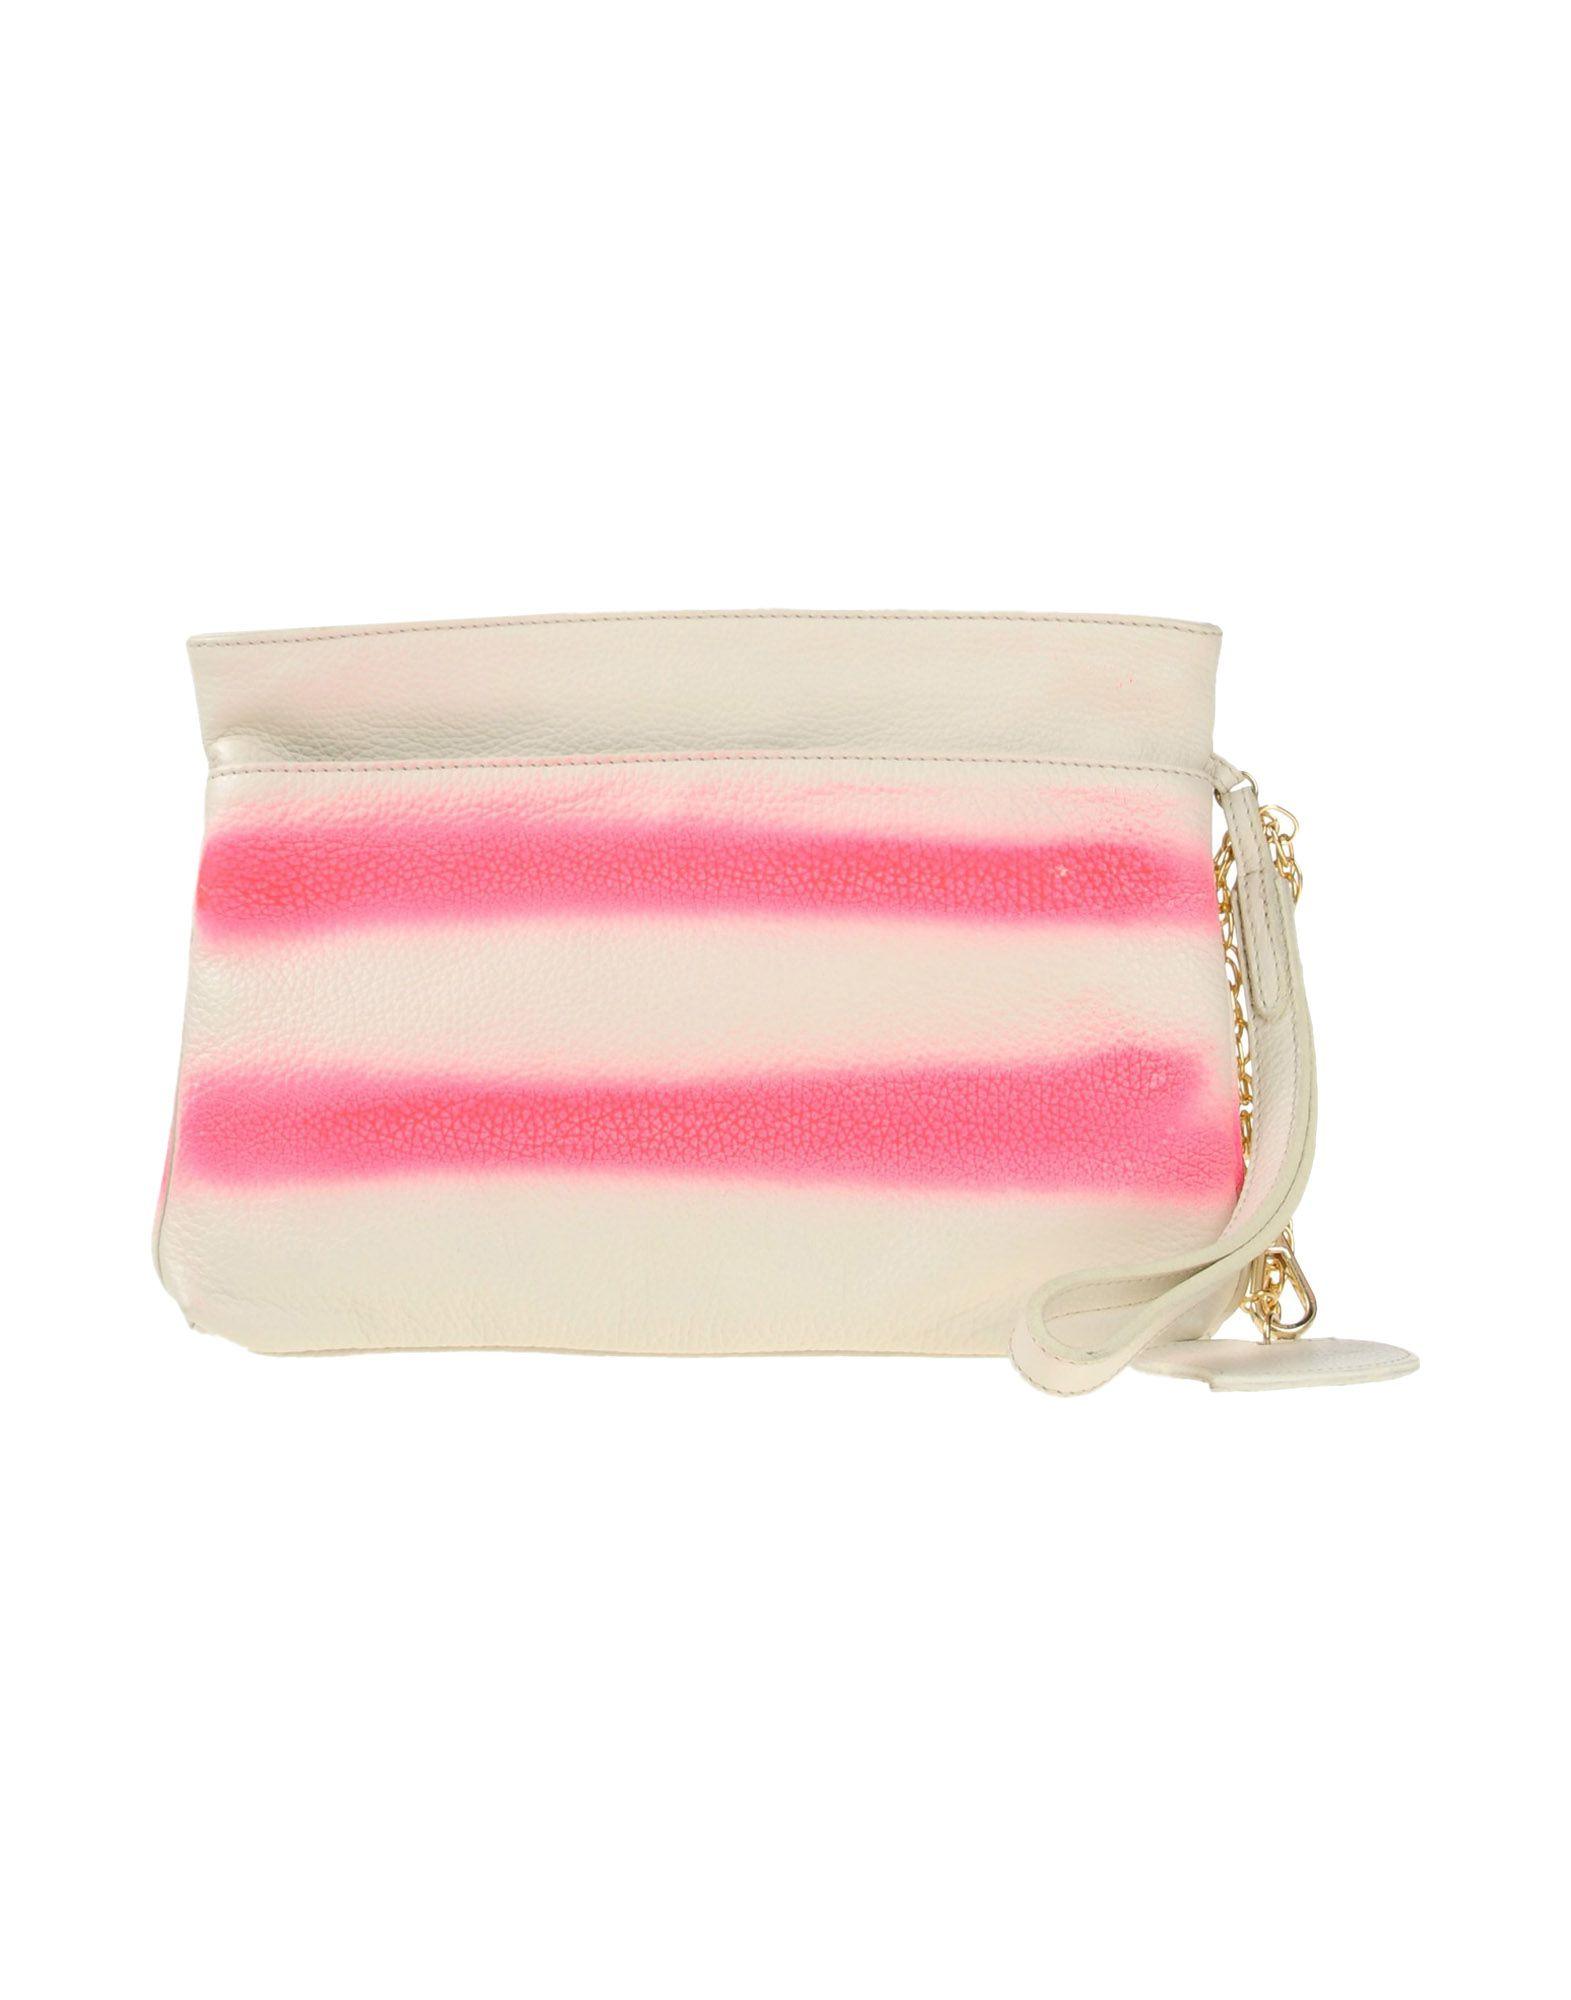 "BECATÃ"" Handbags"